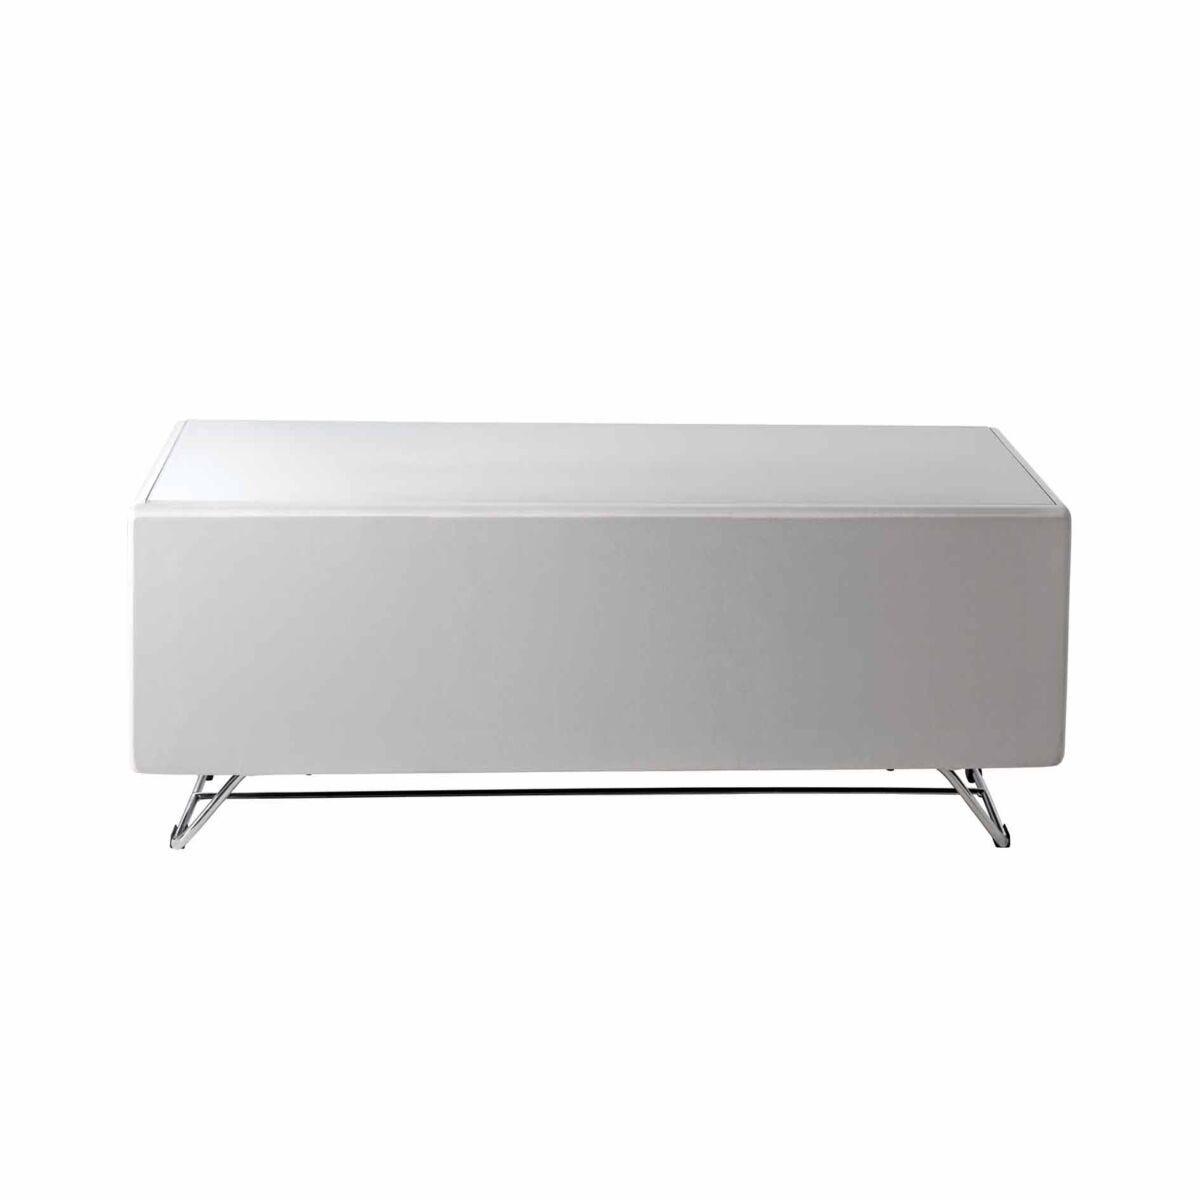 Alphason Chromium Concept 1200 TV Cabinet with Speaker Mesh Front